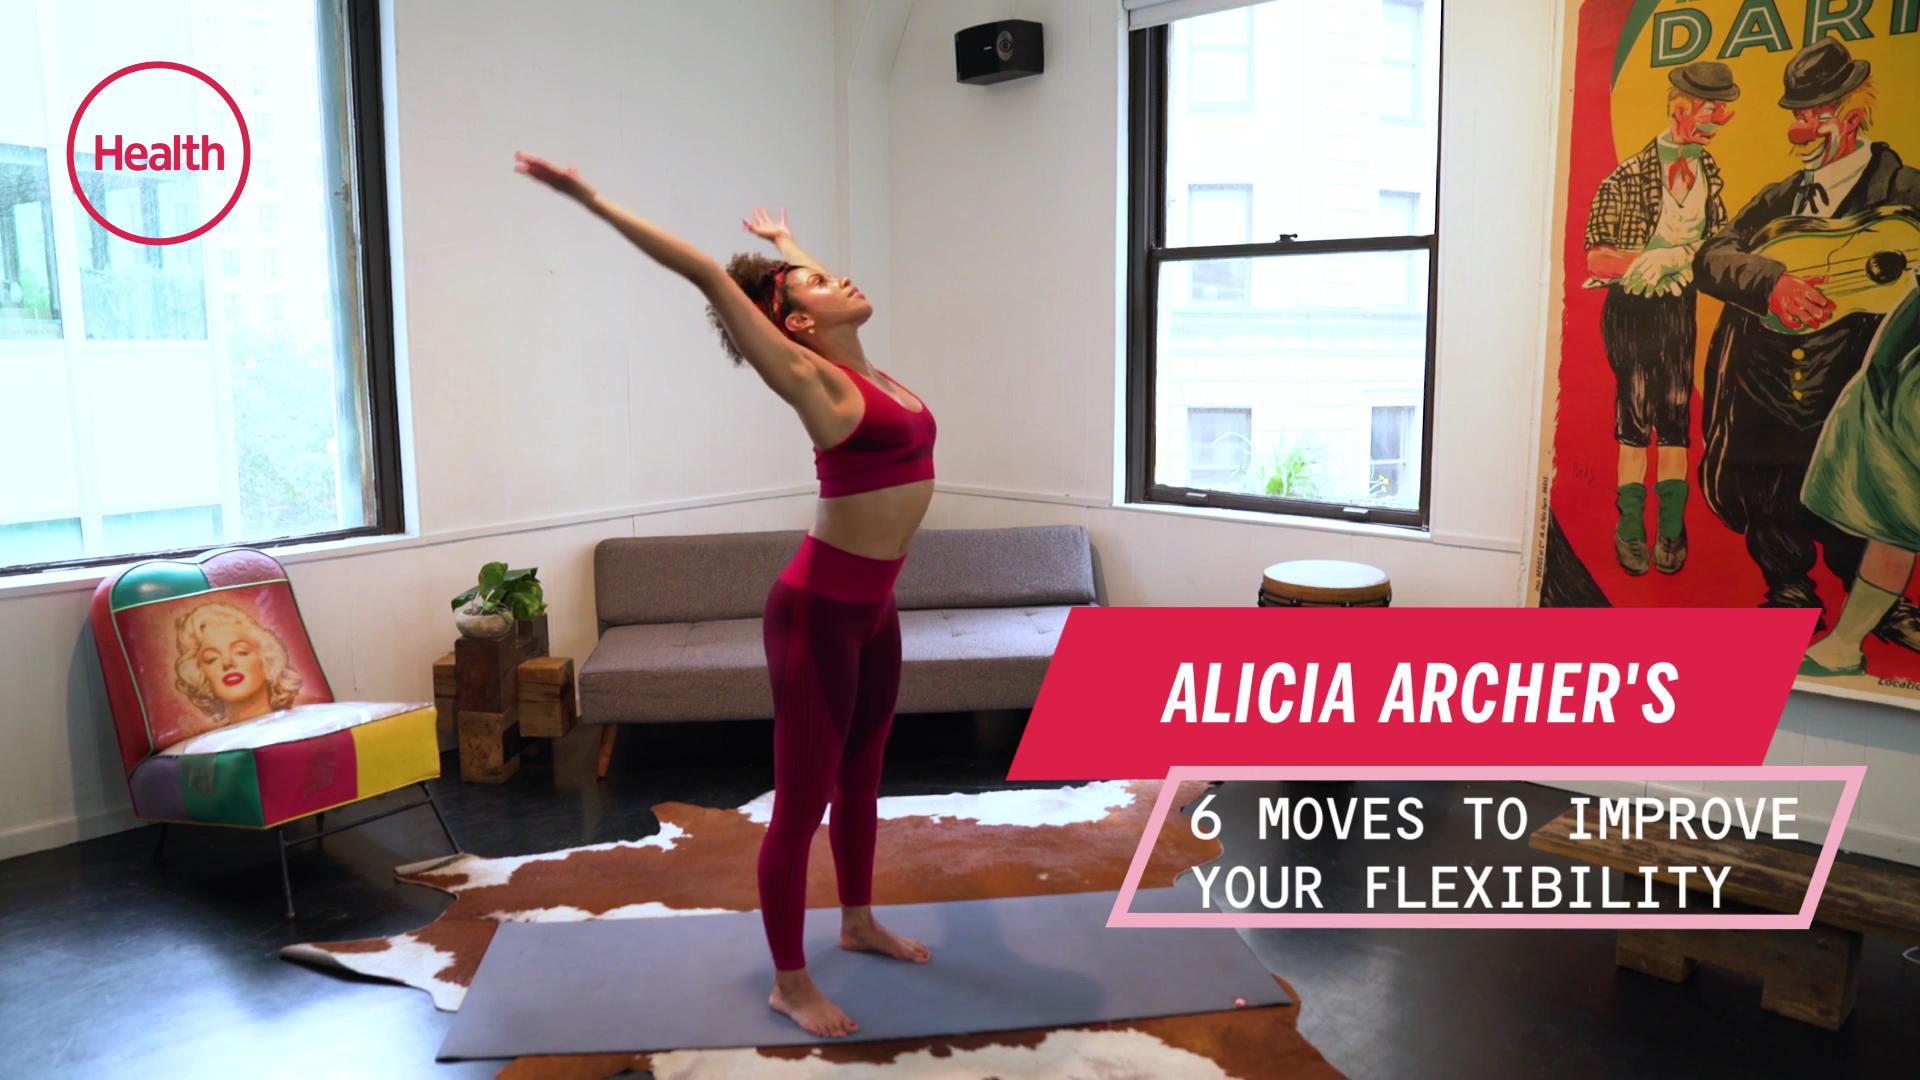 Alicia Archer's 6 Moves To Improve Your Flexibility